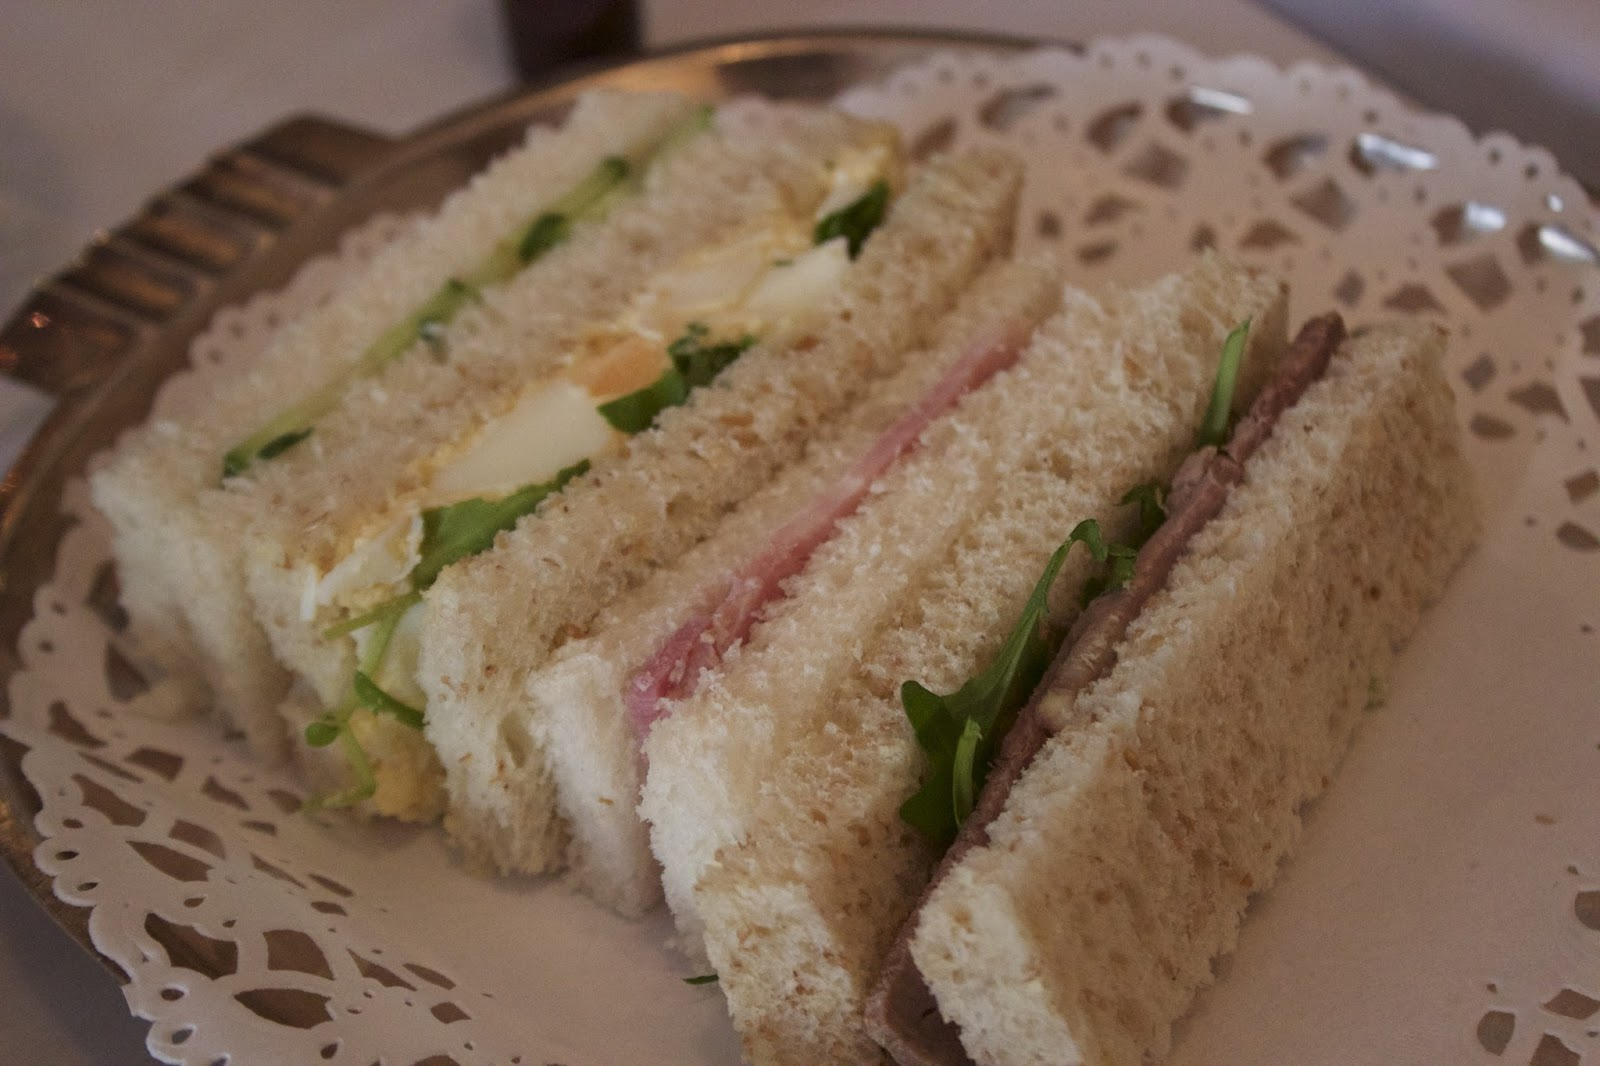 dairy free sandwiches